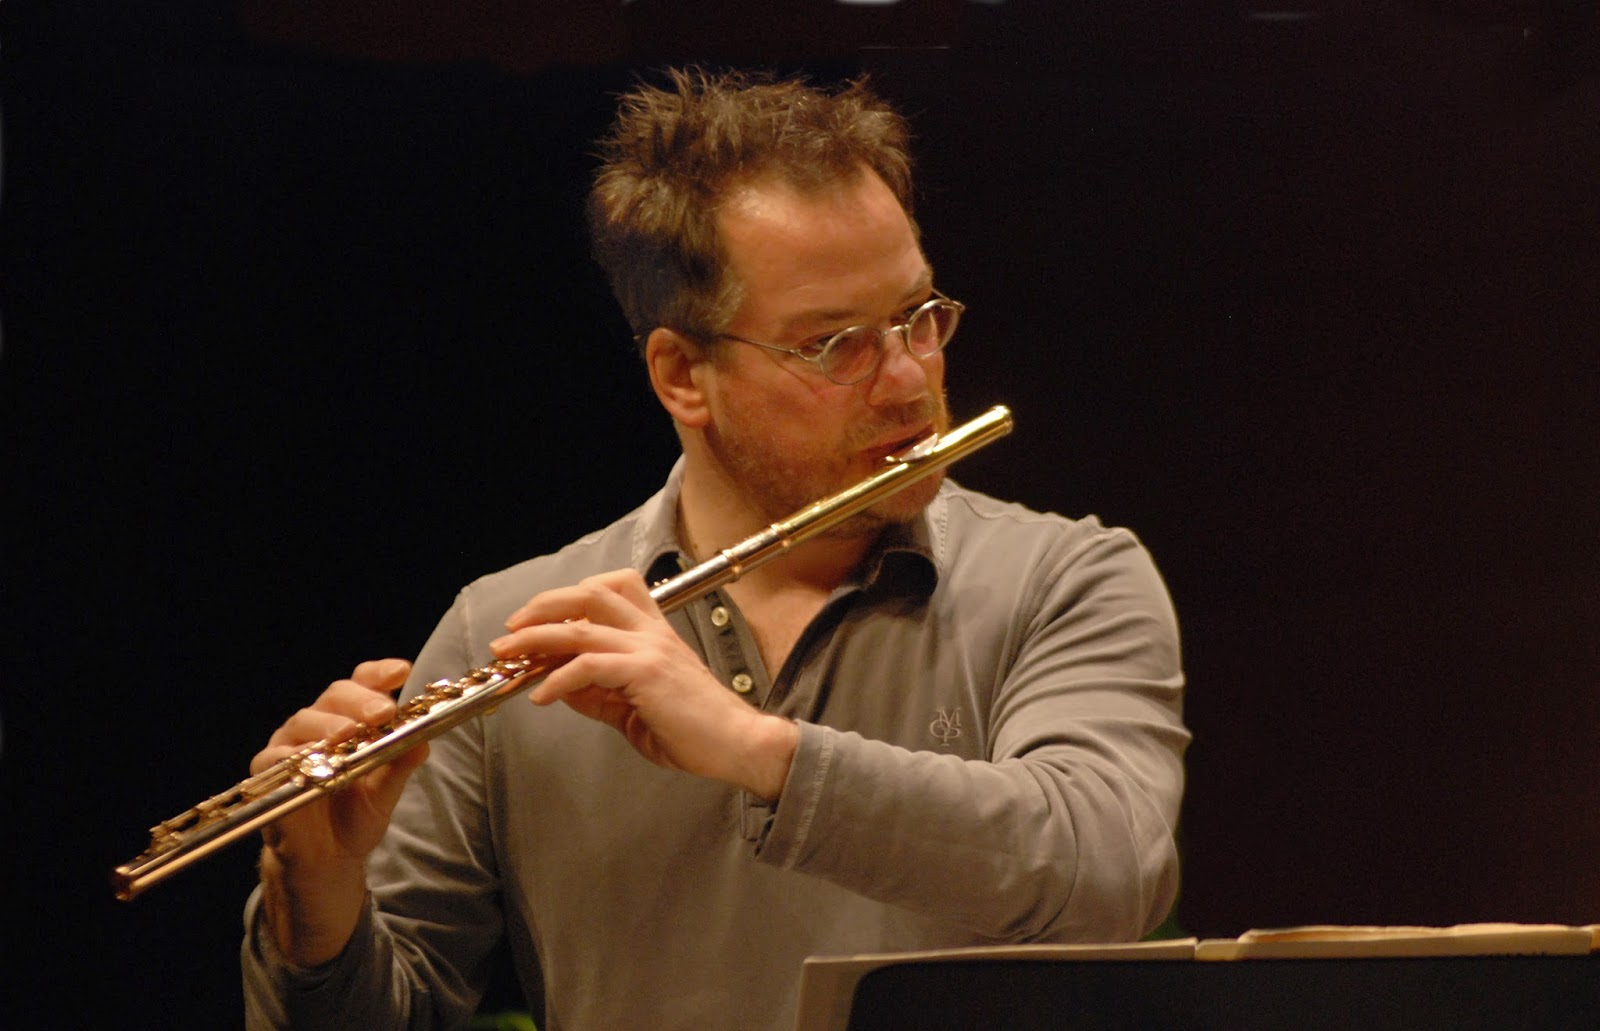 Estudantes de Flauta Haydn Trio Hob XV 25 in G major Flautista Emmanuel Pahud